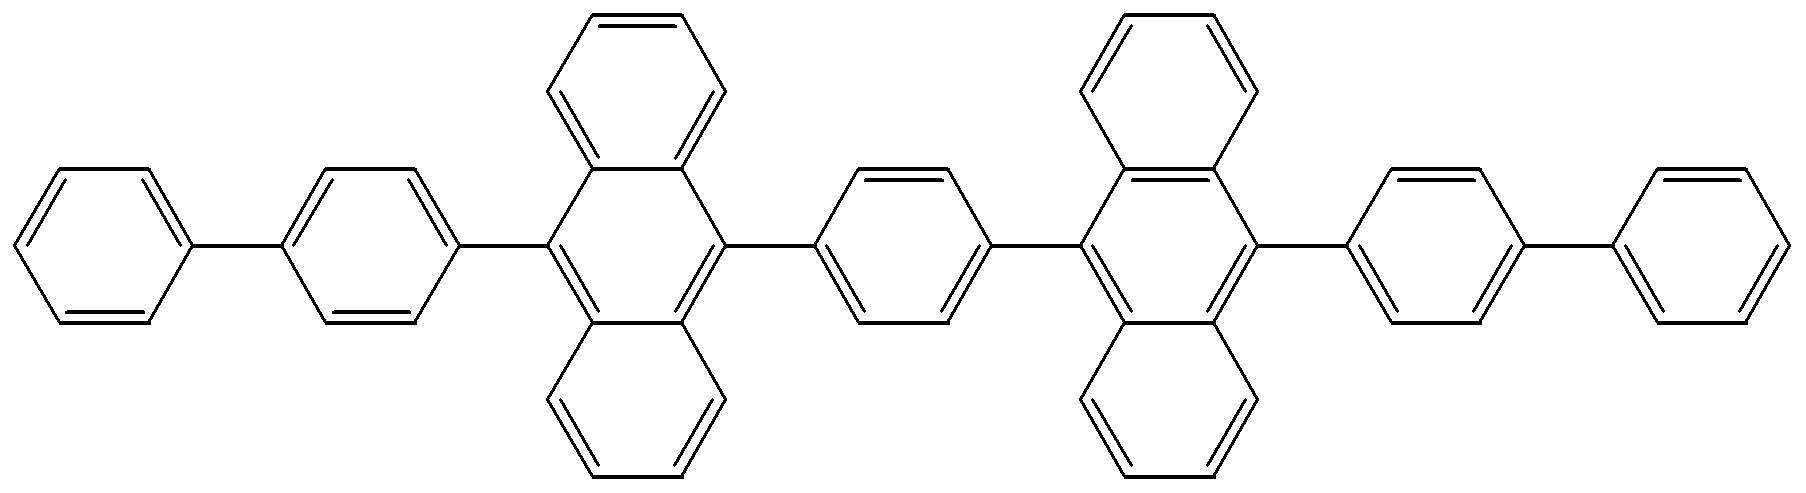 Figure 112005017102381-pat00016